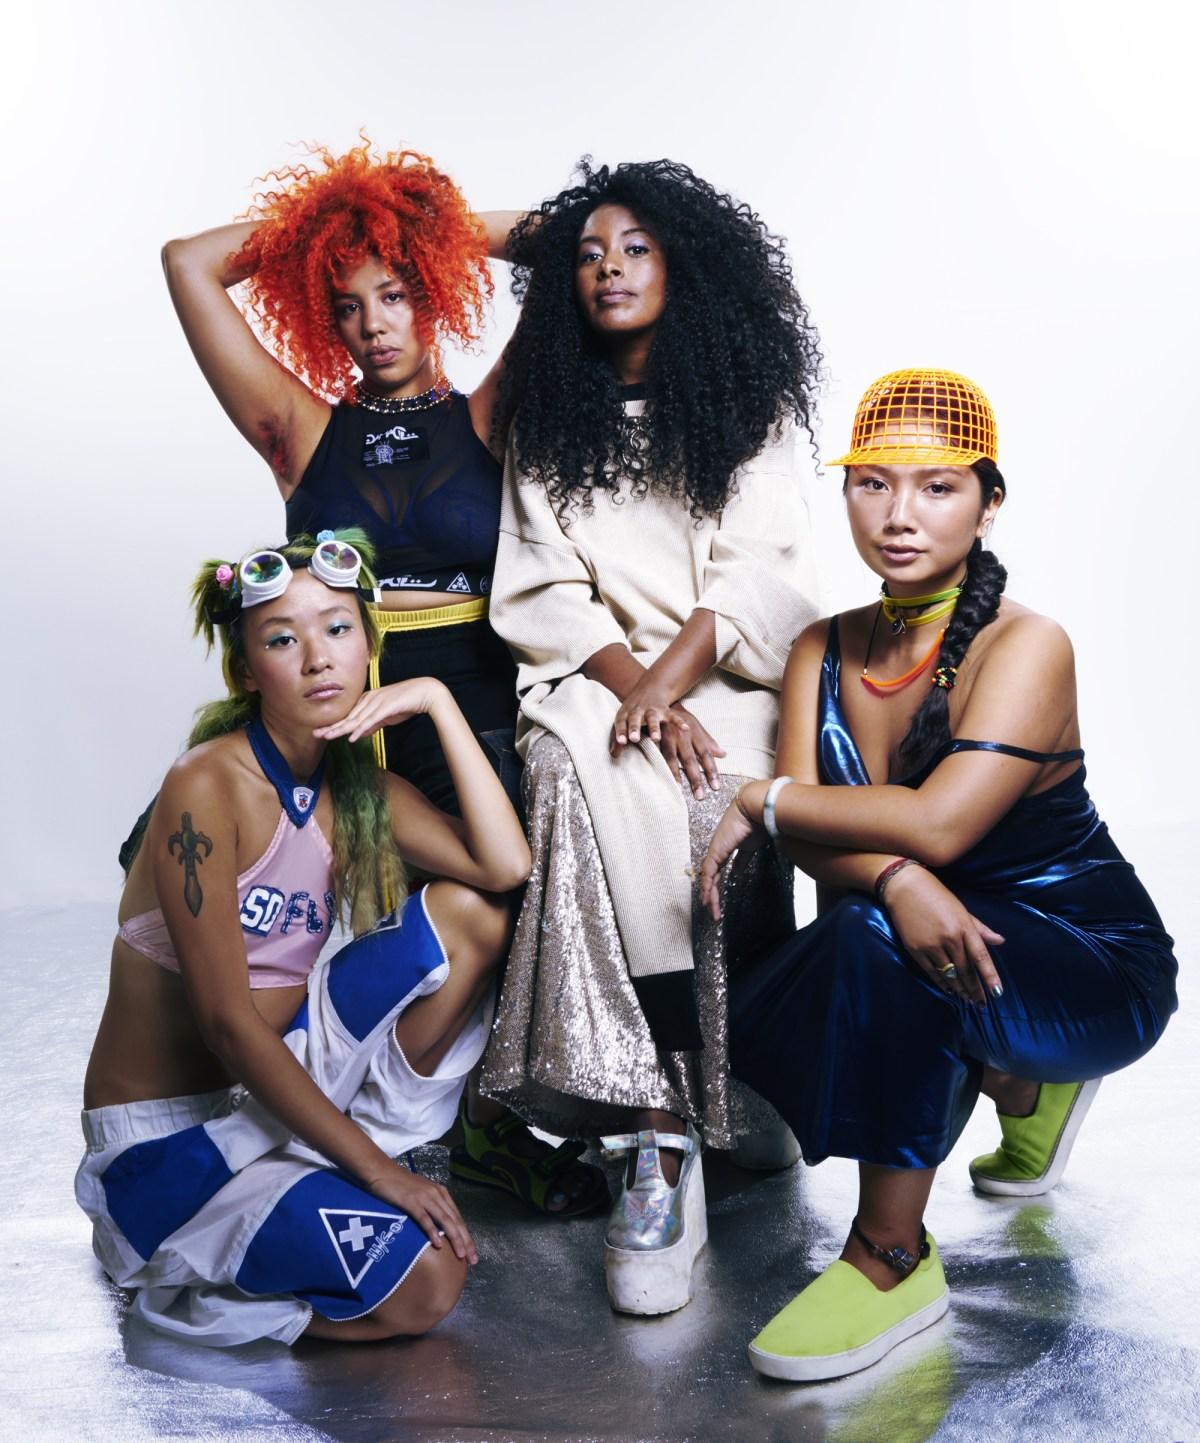 Sonia Choi, Jazmin Jones, Tsige Tafesse, Katherine Tom | Photo by AnRong Xu